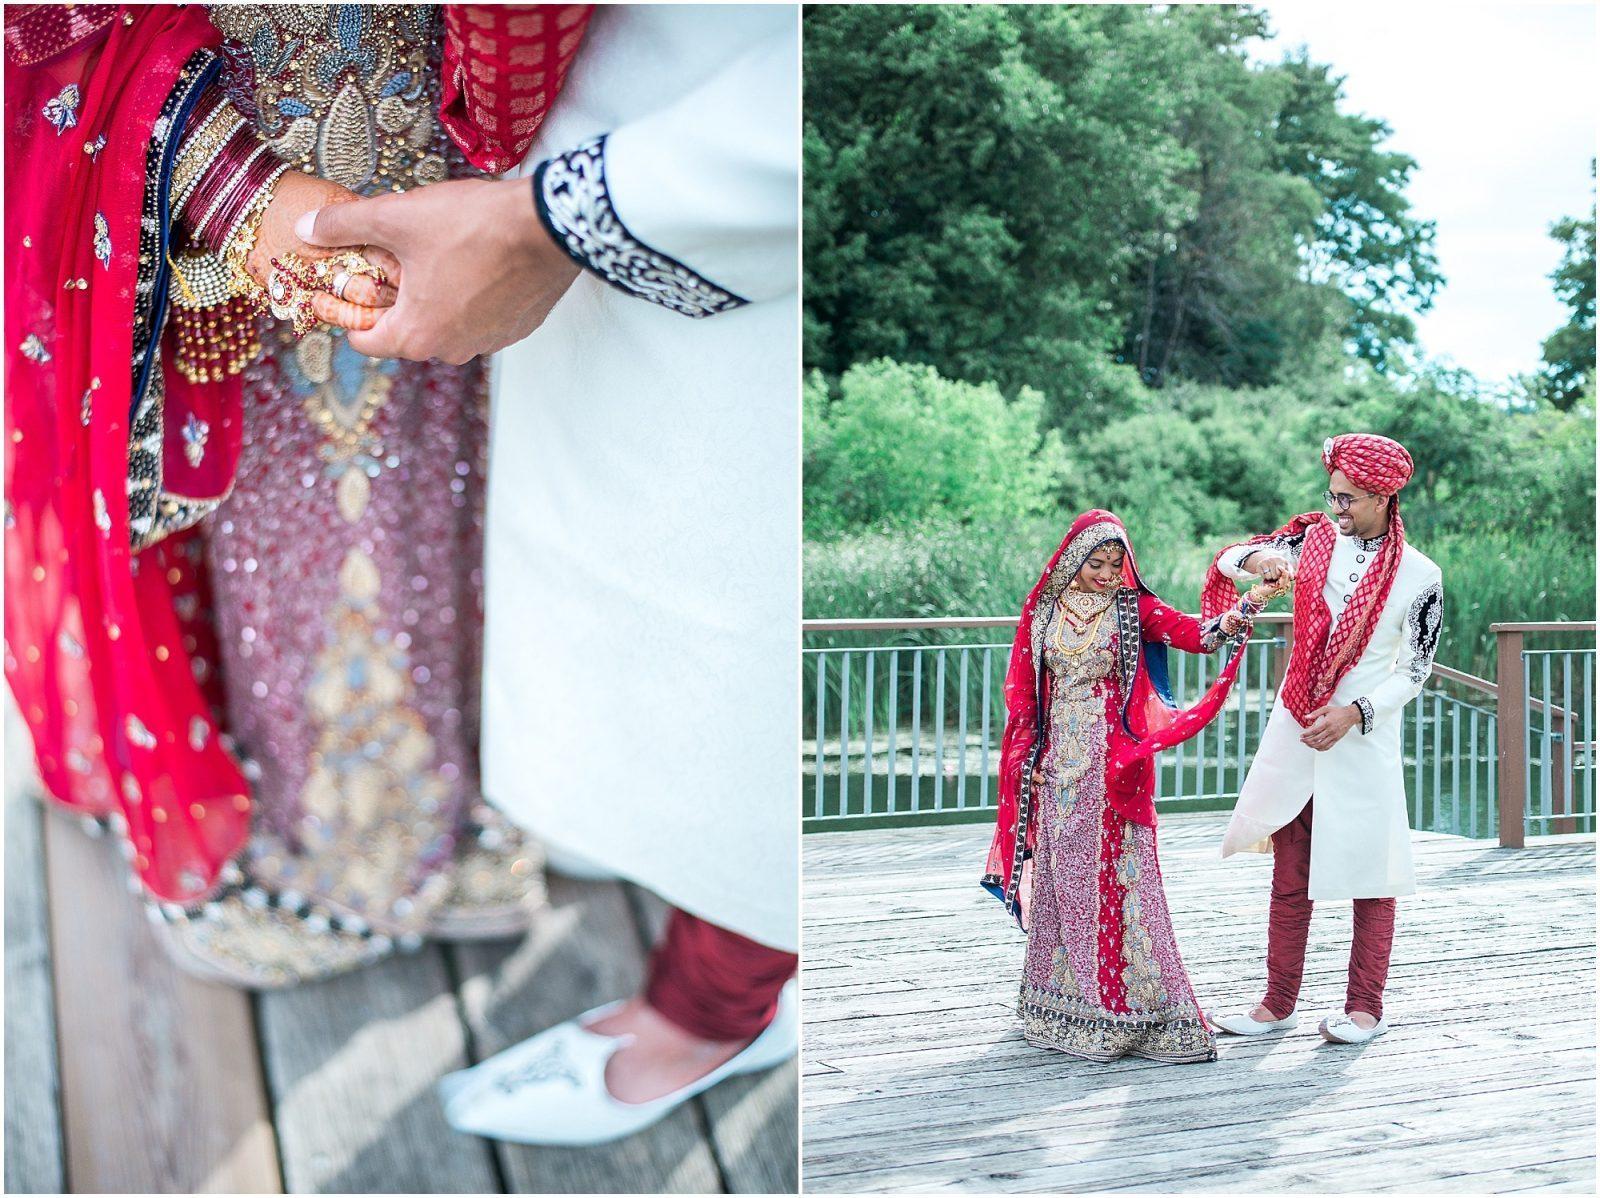 South Asian Wedding Toronto Photography - Mehndi, Nikah, walima, indian wedding, pakistani wedding. Sarah & Sajid - first look